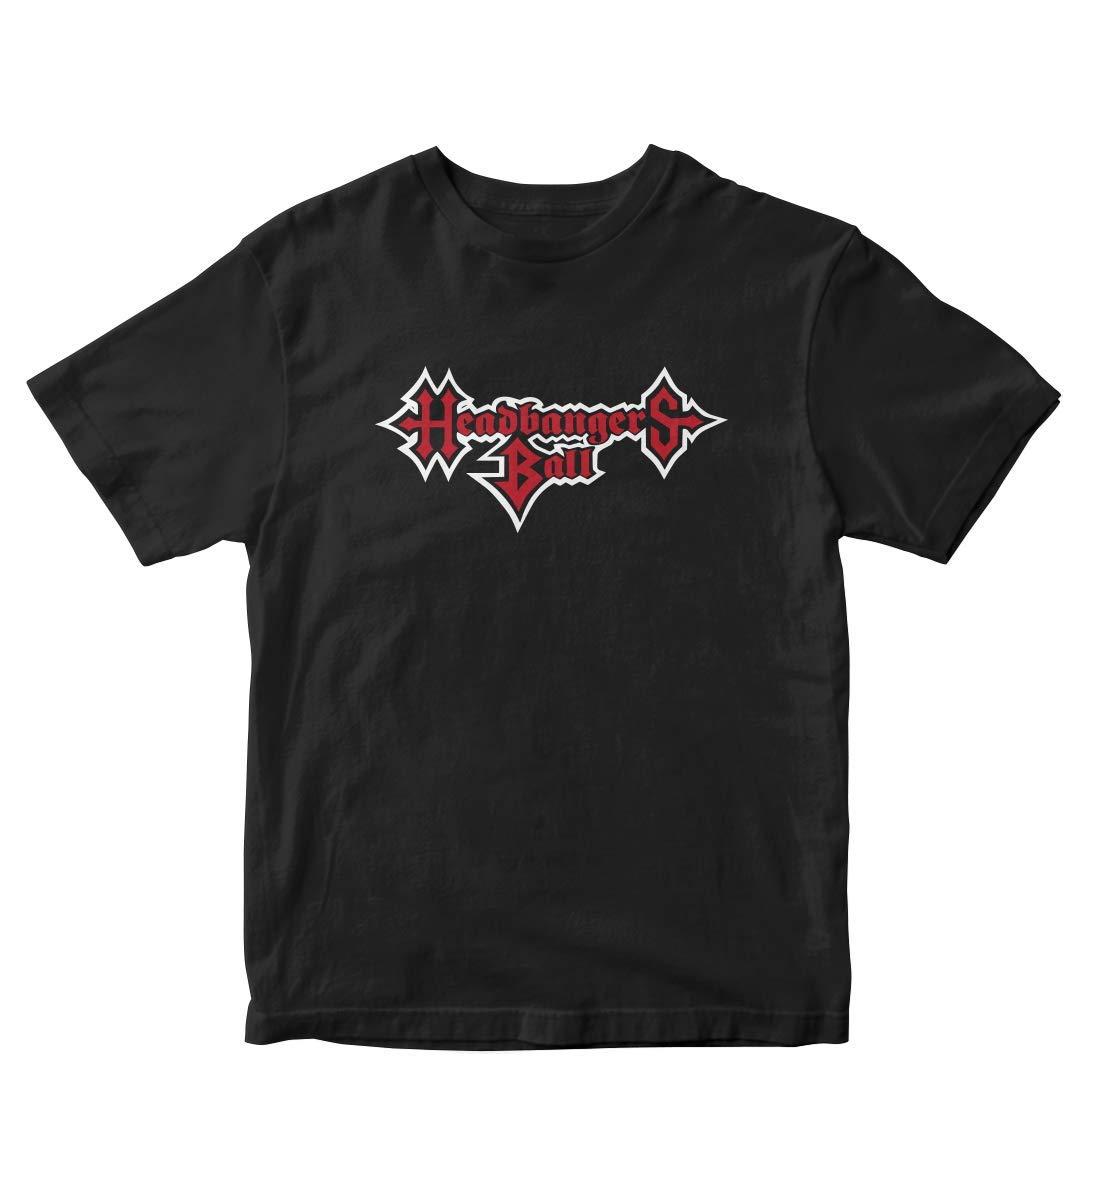 Headbangers Ball Tv Rock Show Black Shirt S M103